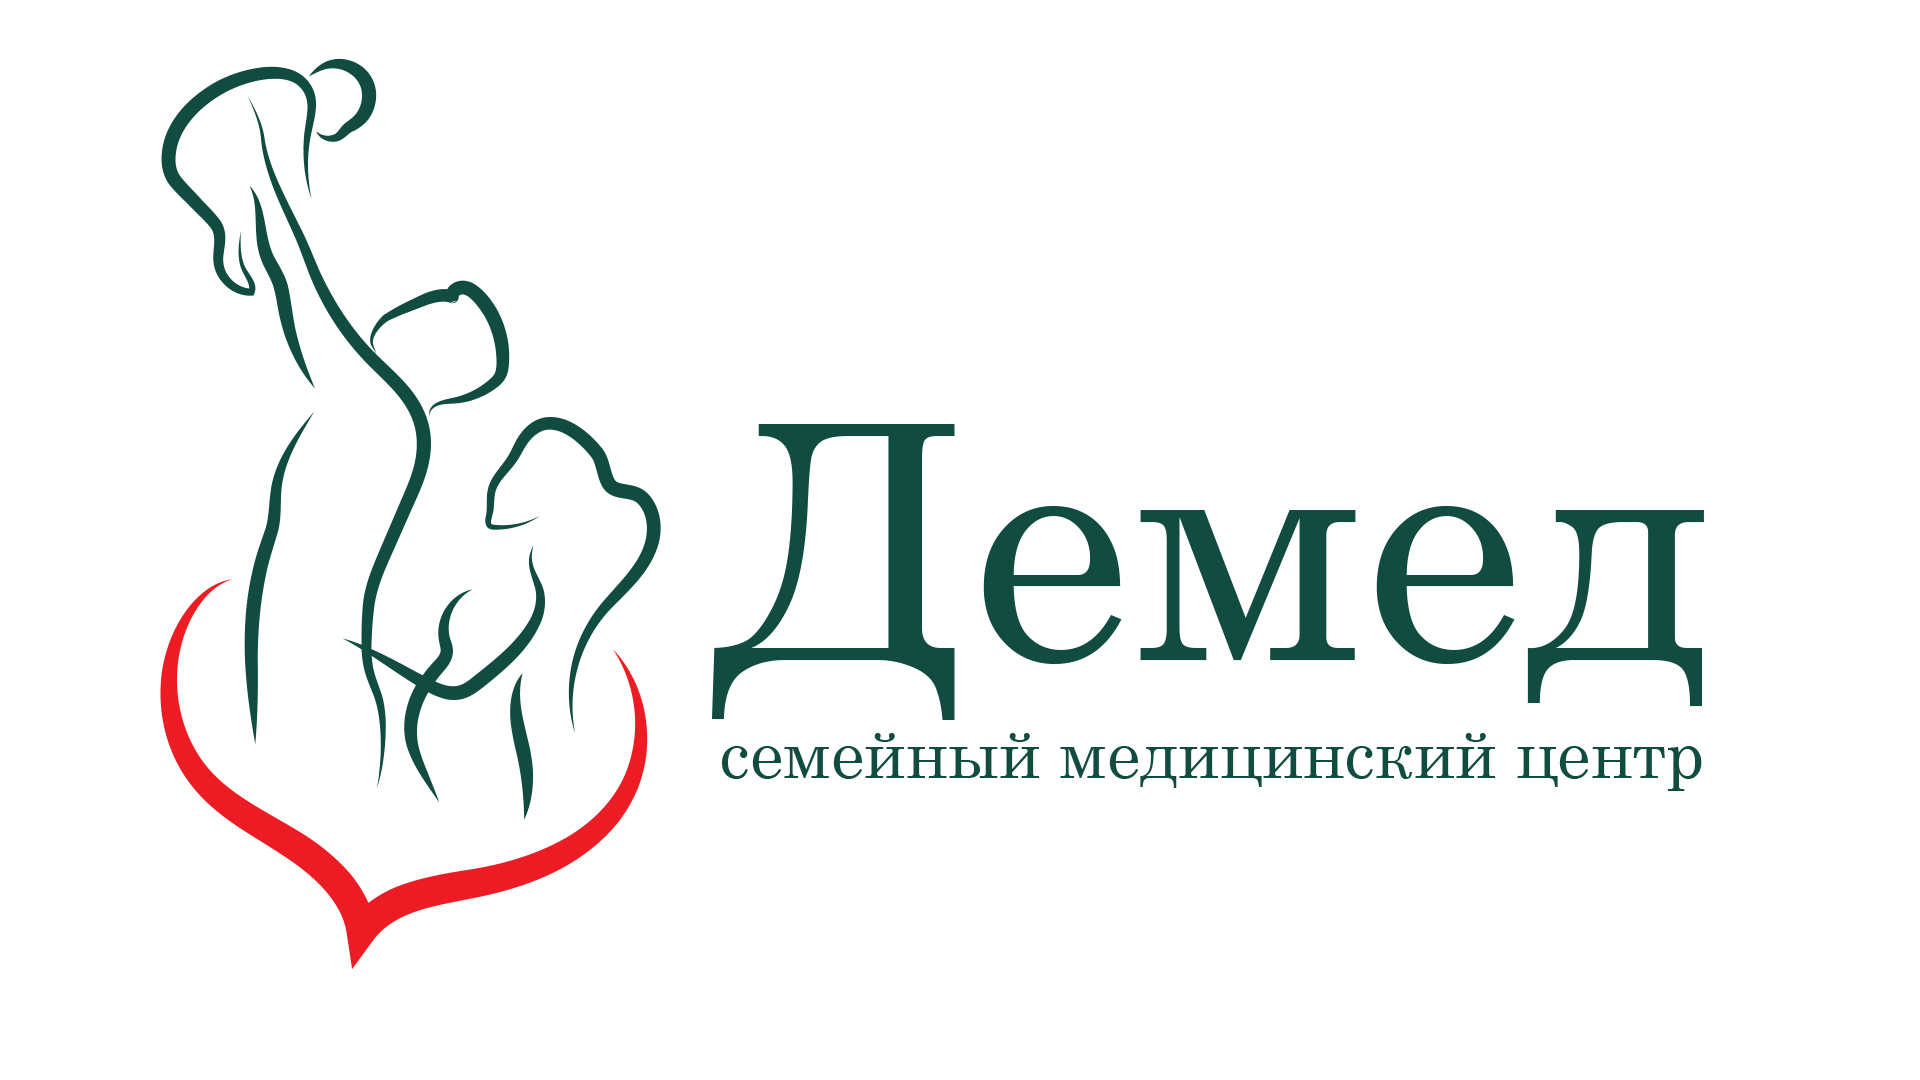 Логотип медицинского центра фото f_6325dce3a2ab4647.jpg